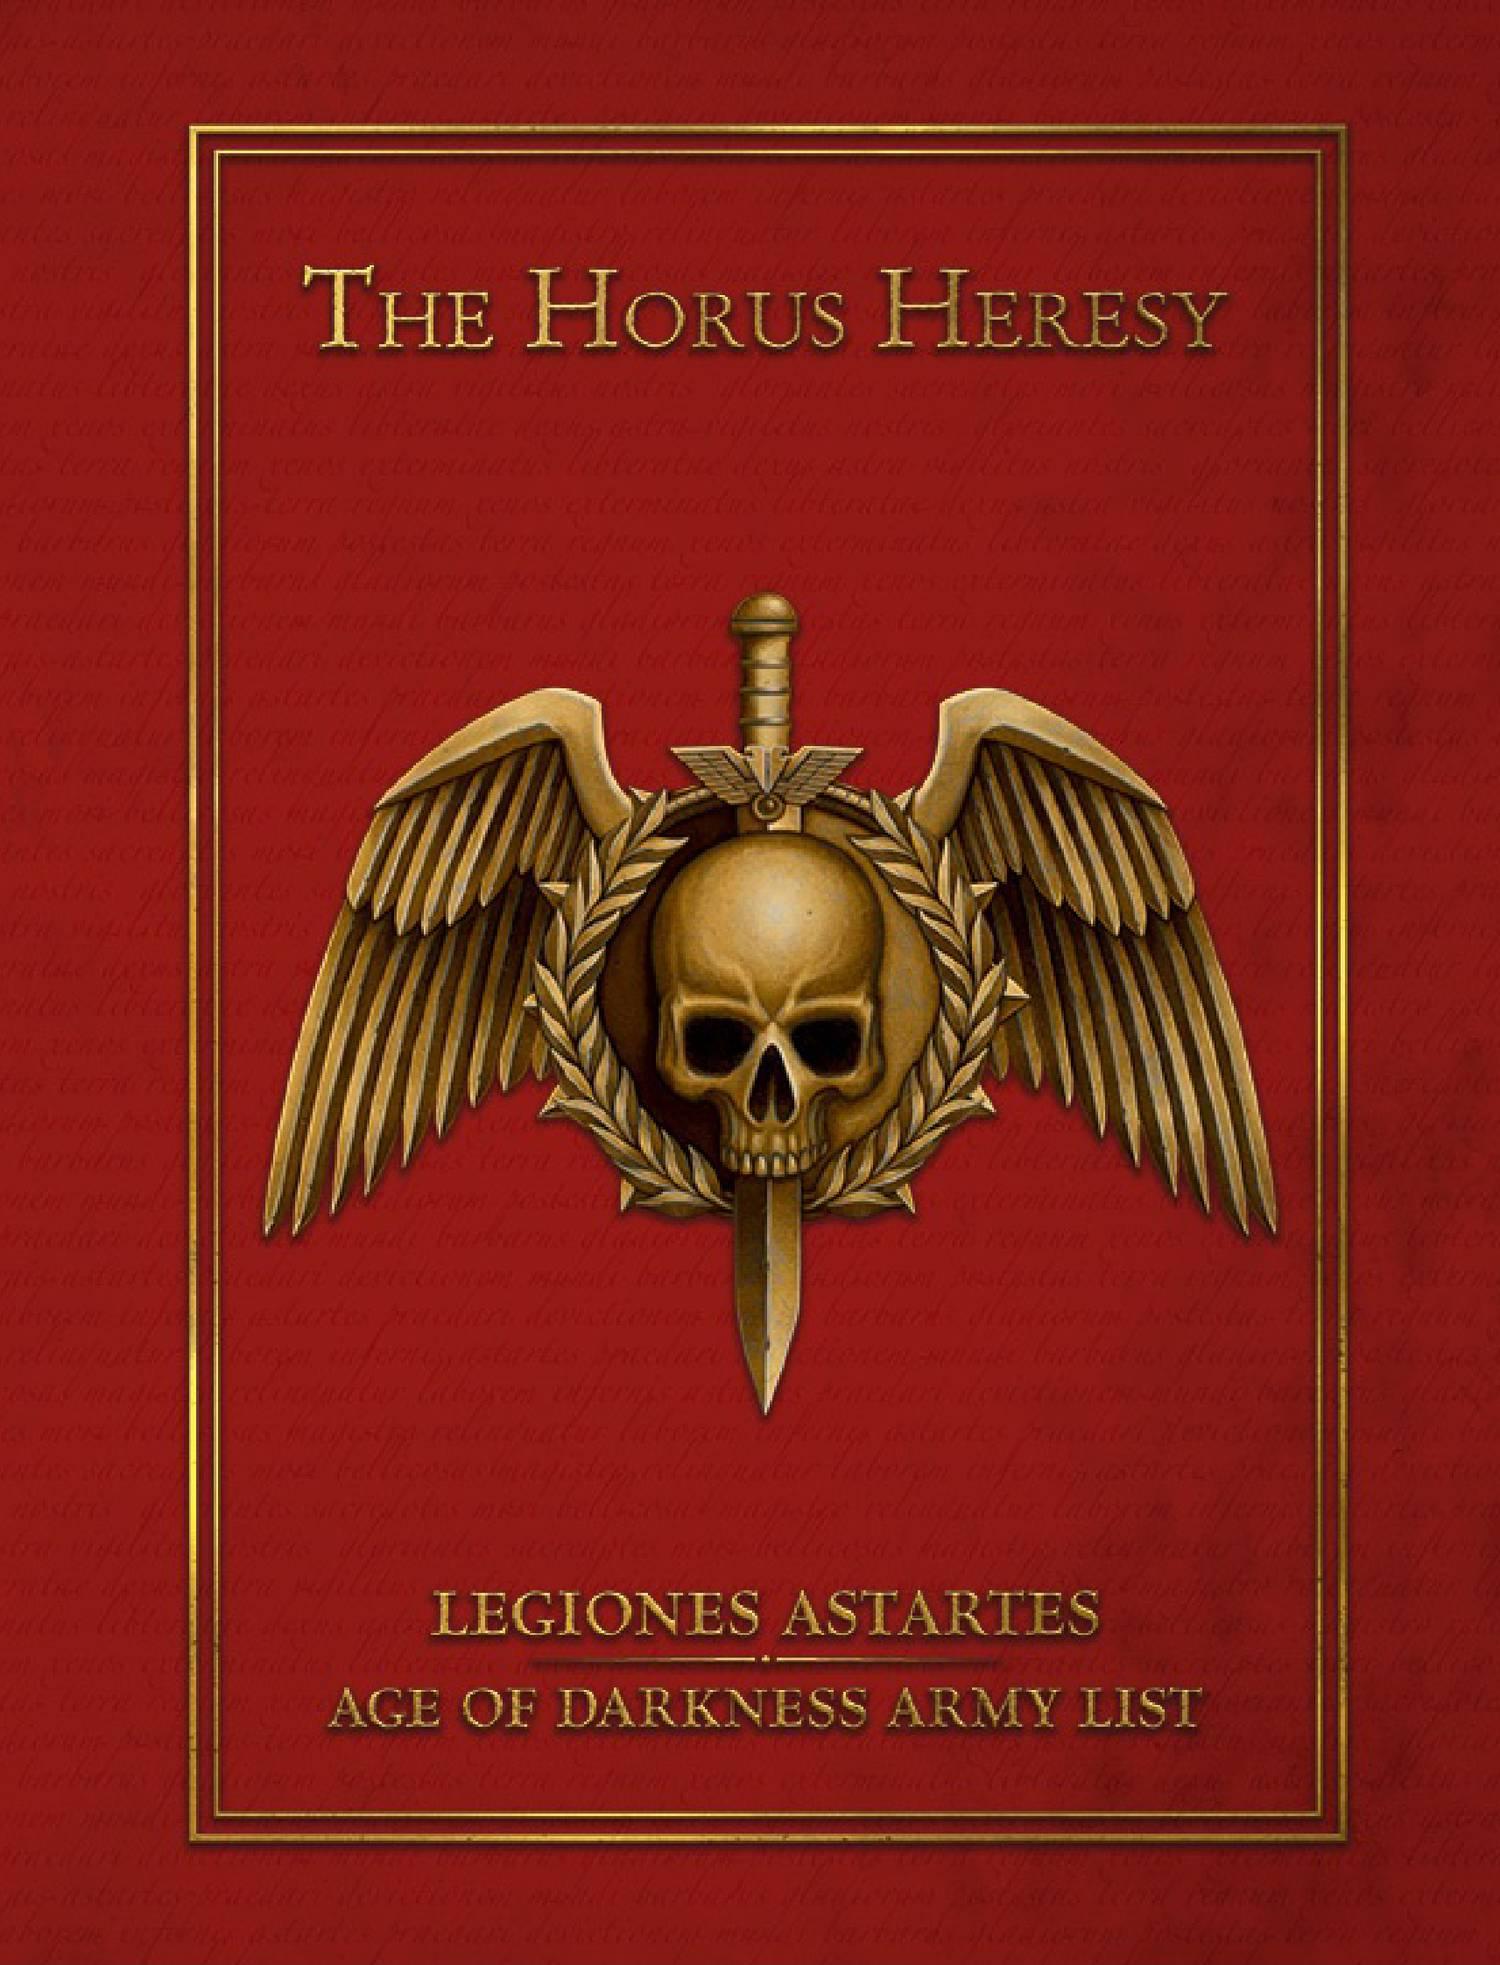 Legiones Astartes Age of Darkness Army List pdf | DocDroid